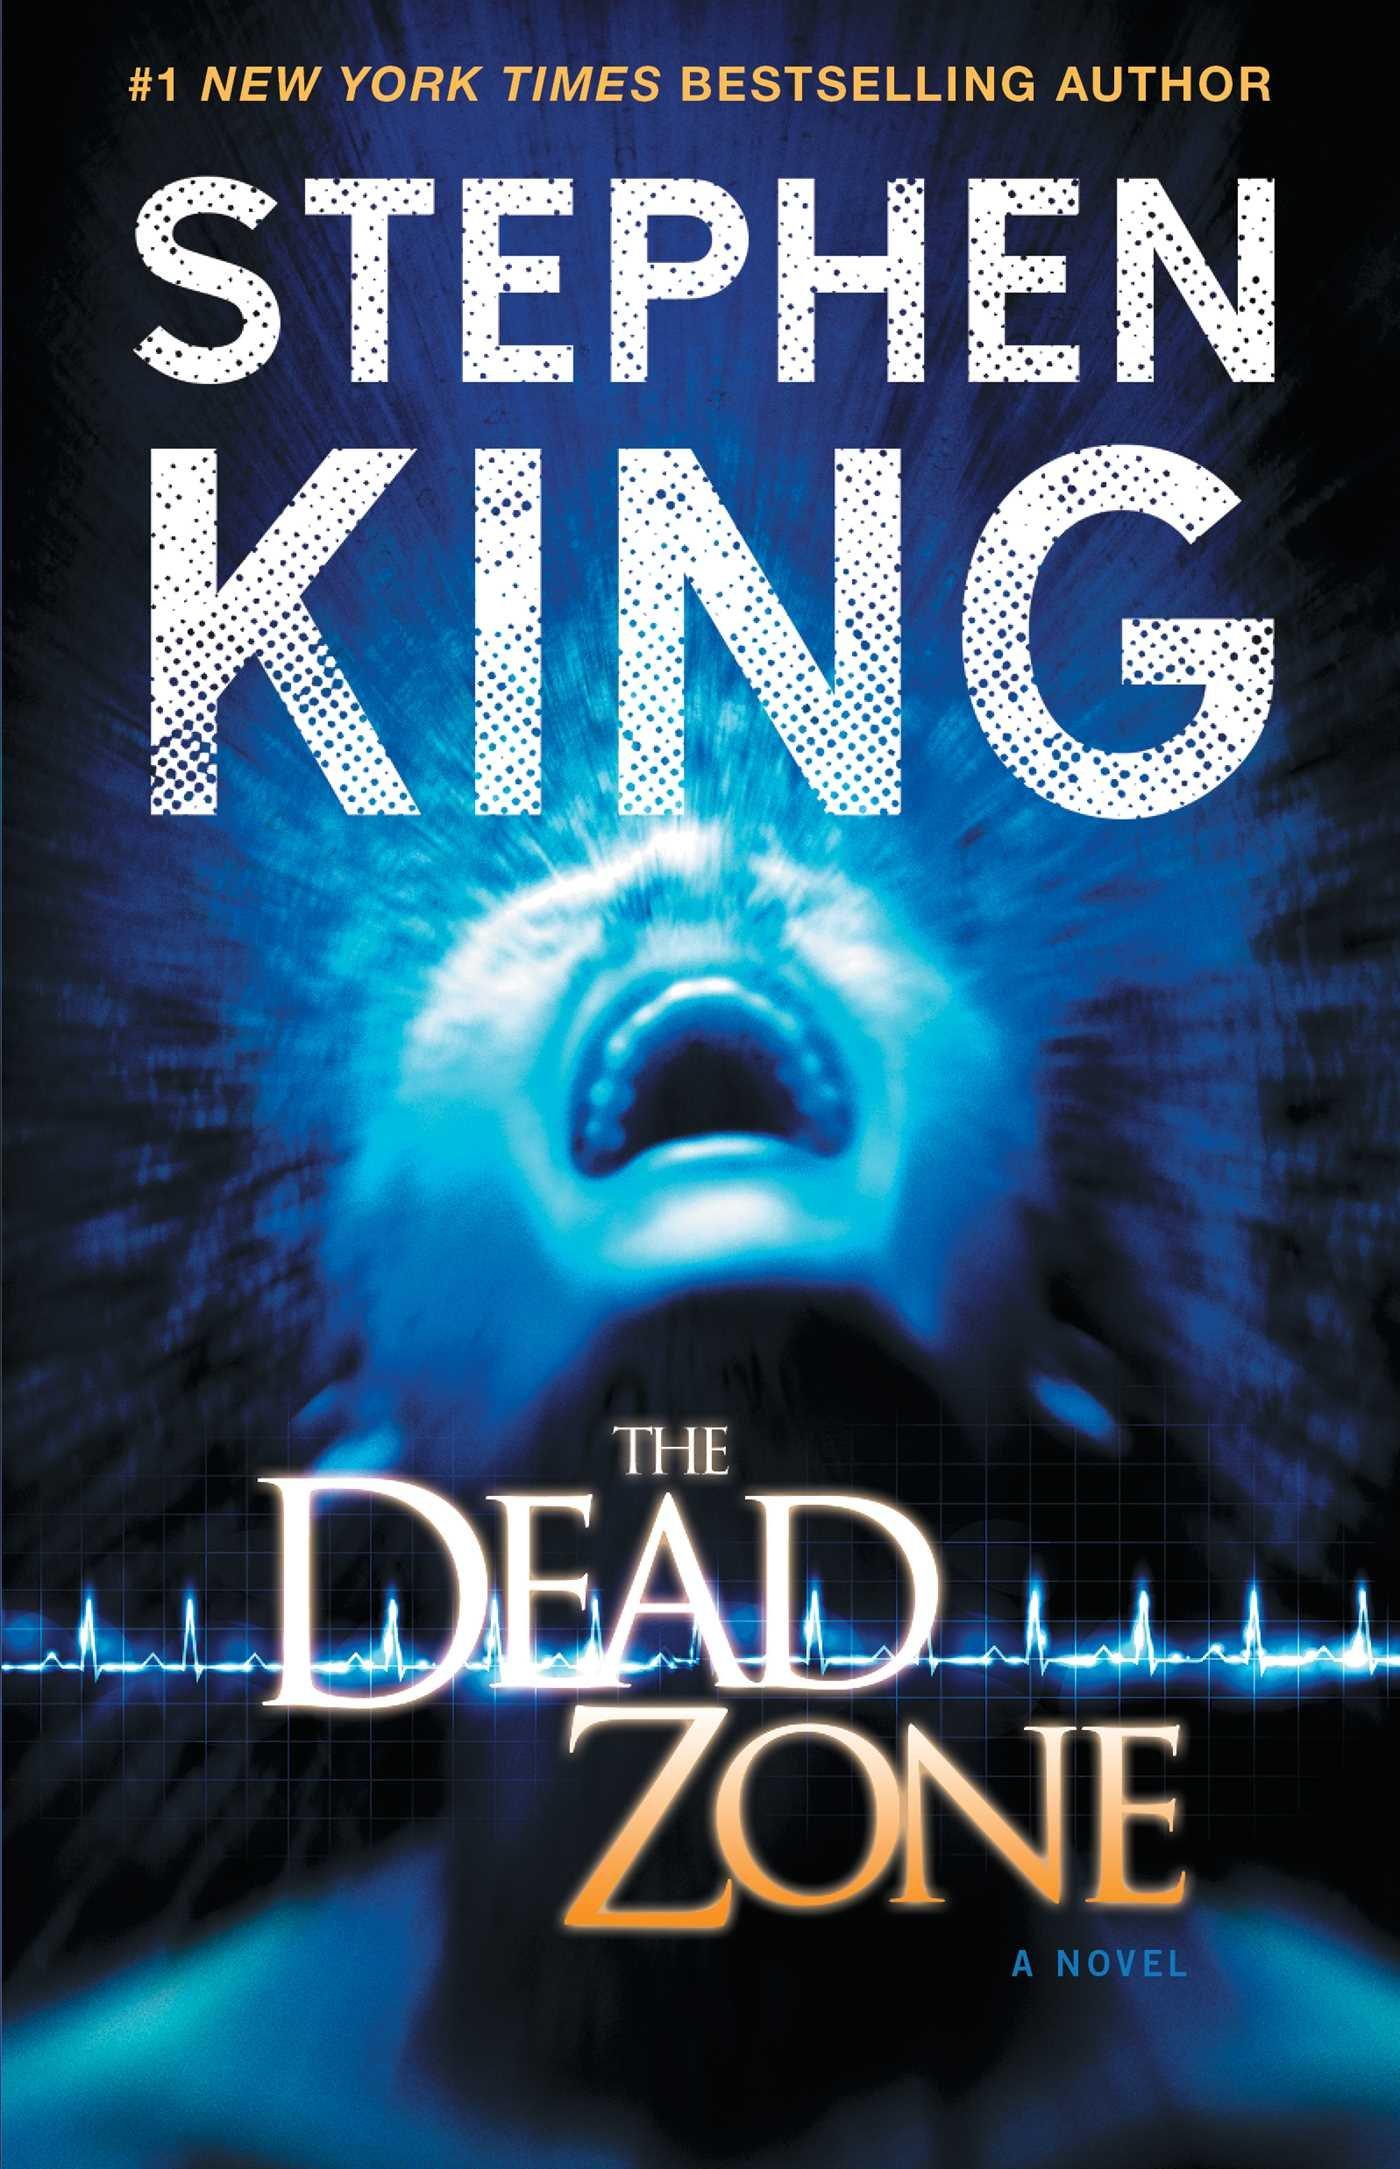 Dead Zone, The (novel)